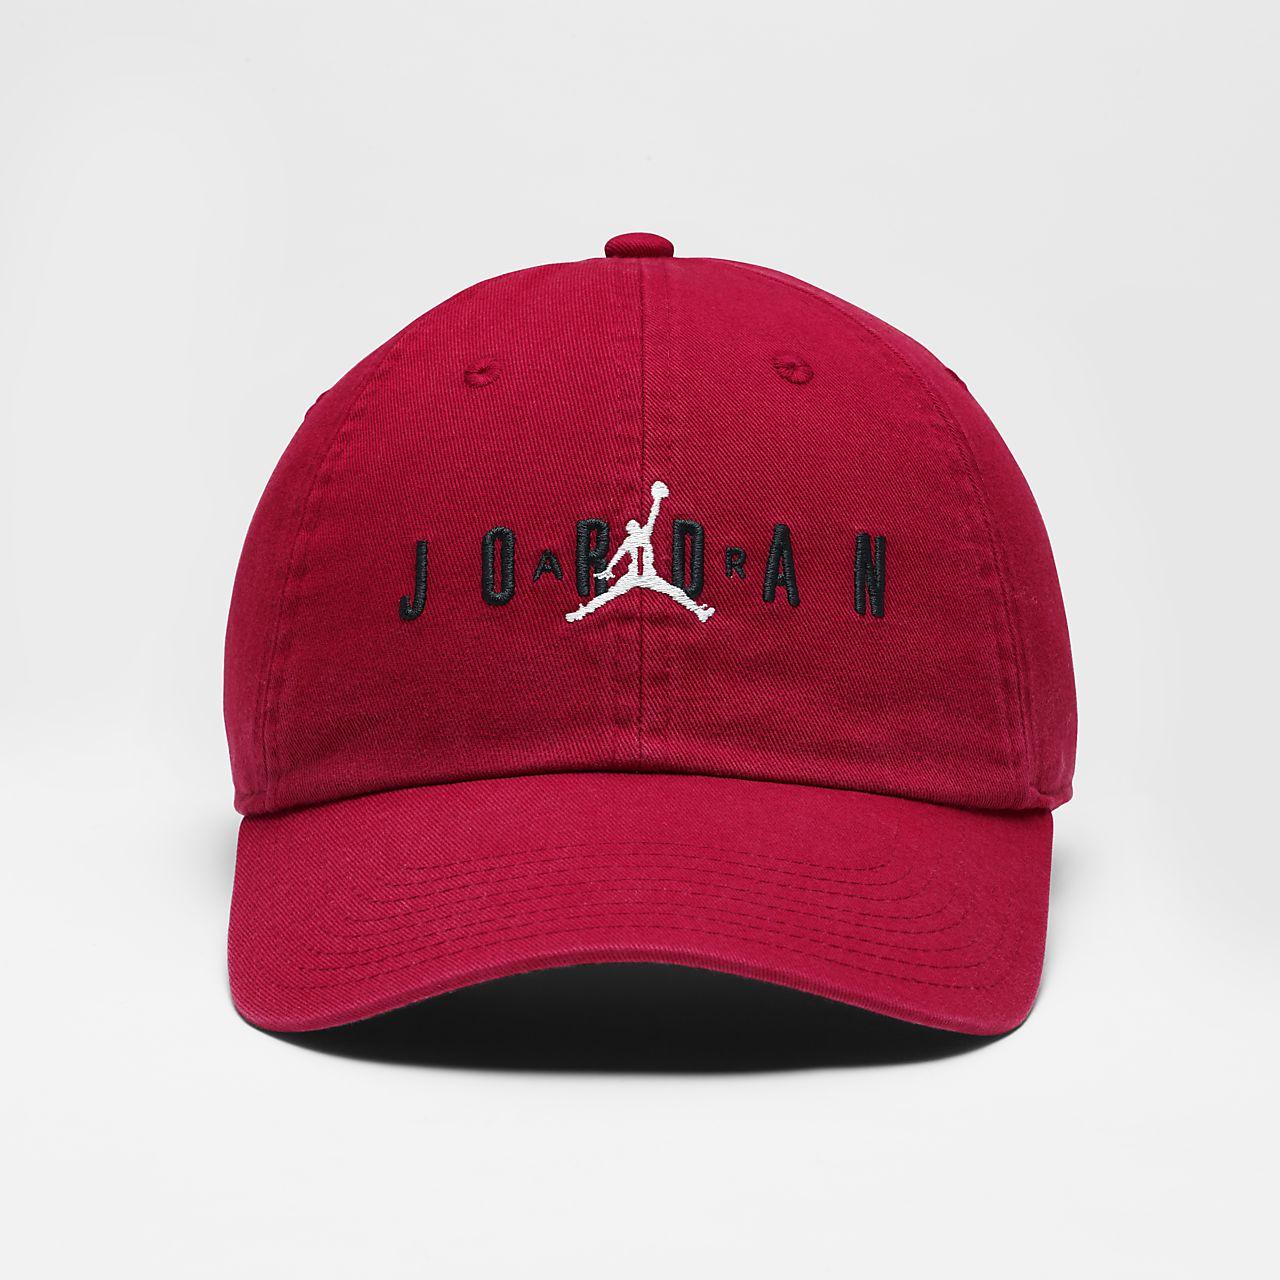 e7c7d493830 Jordan Heritage 86 Jumpman Air Adjustable Hat. Nike.com